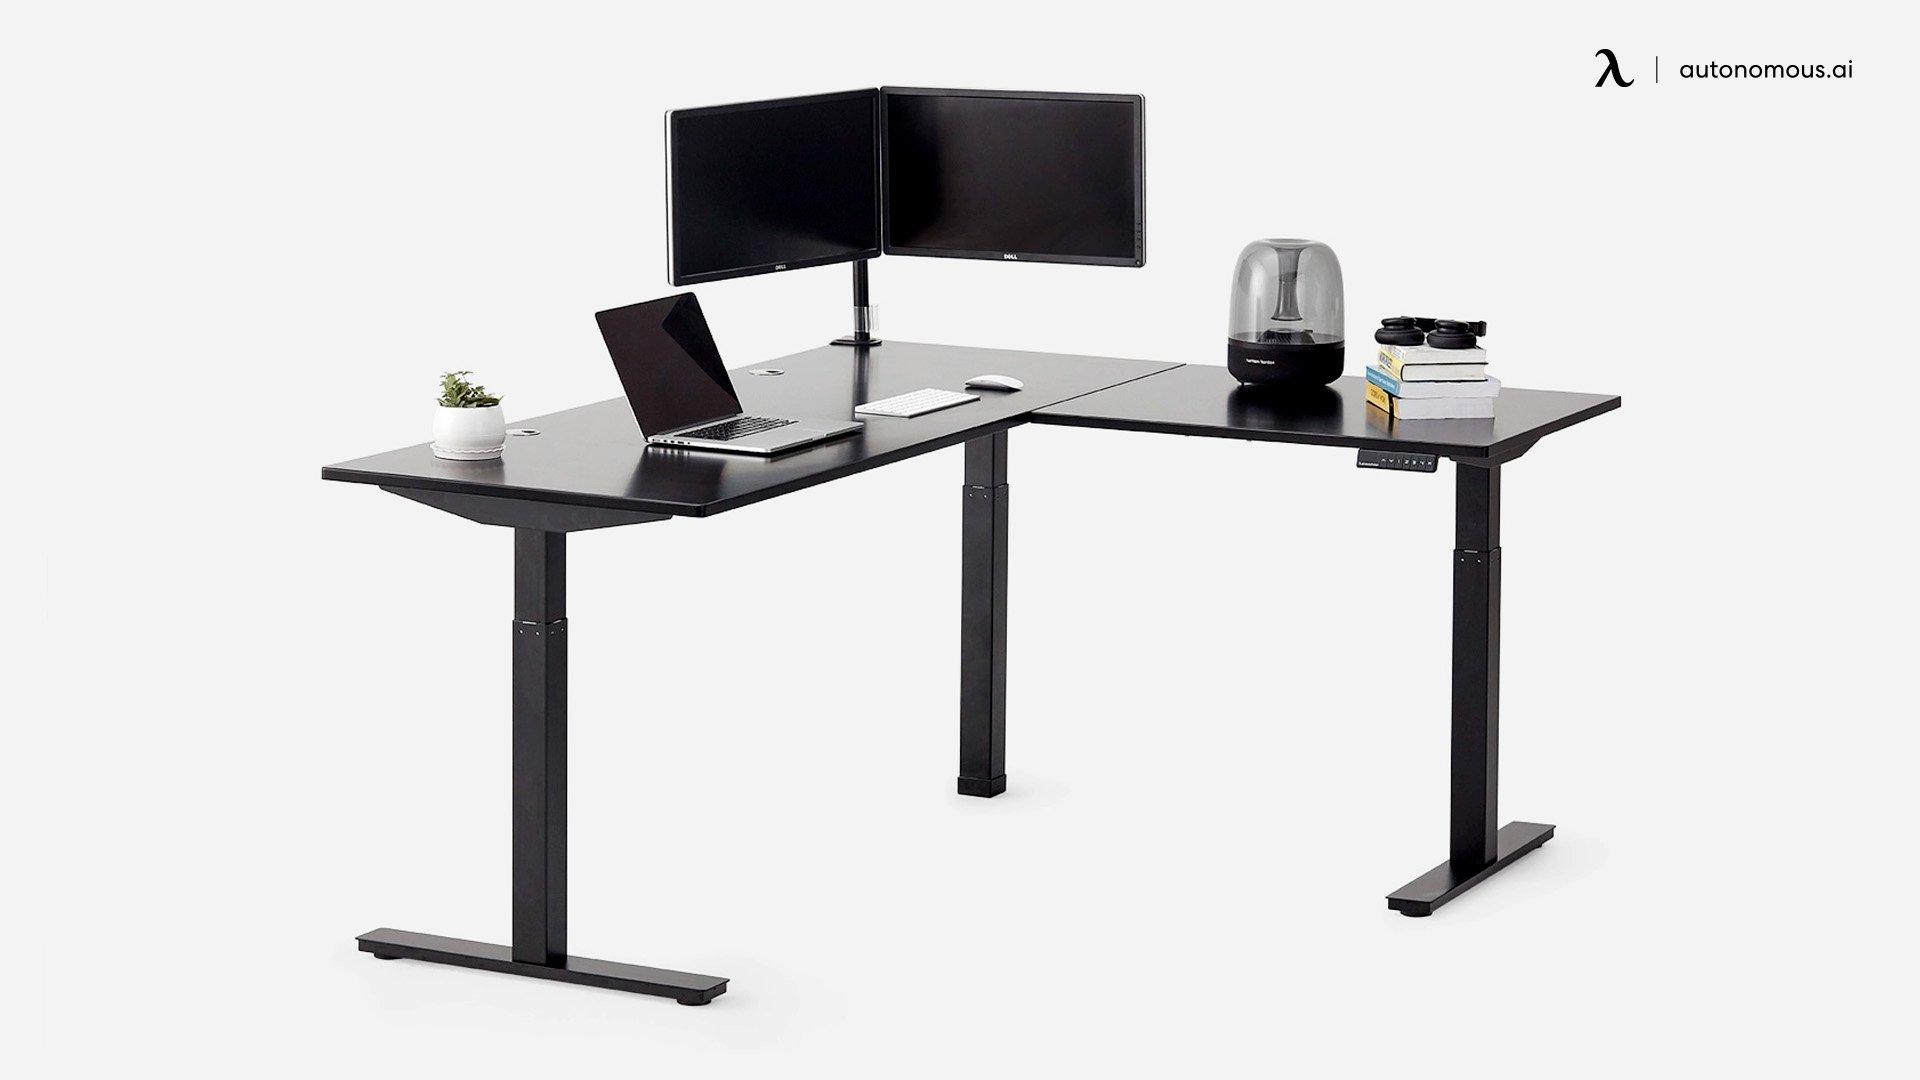 Bigger desk sizes